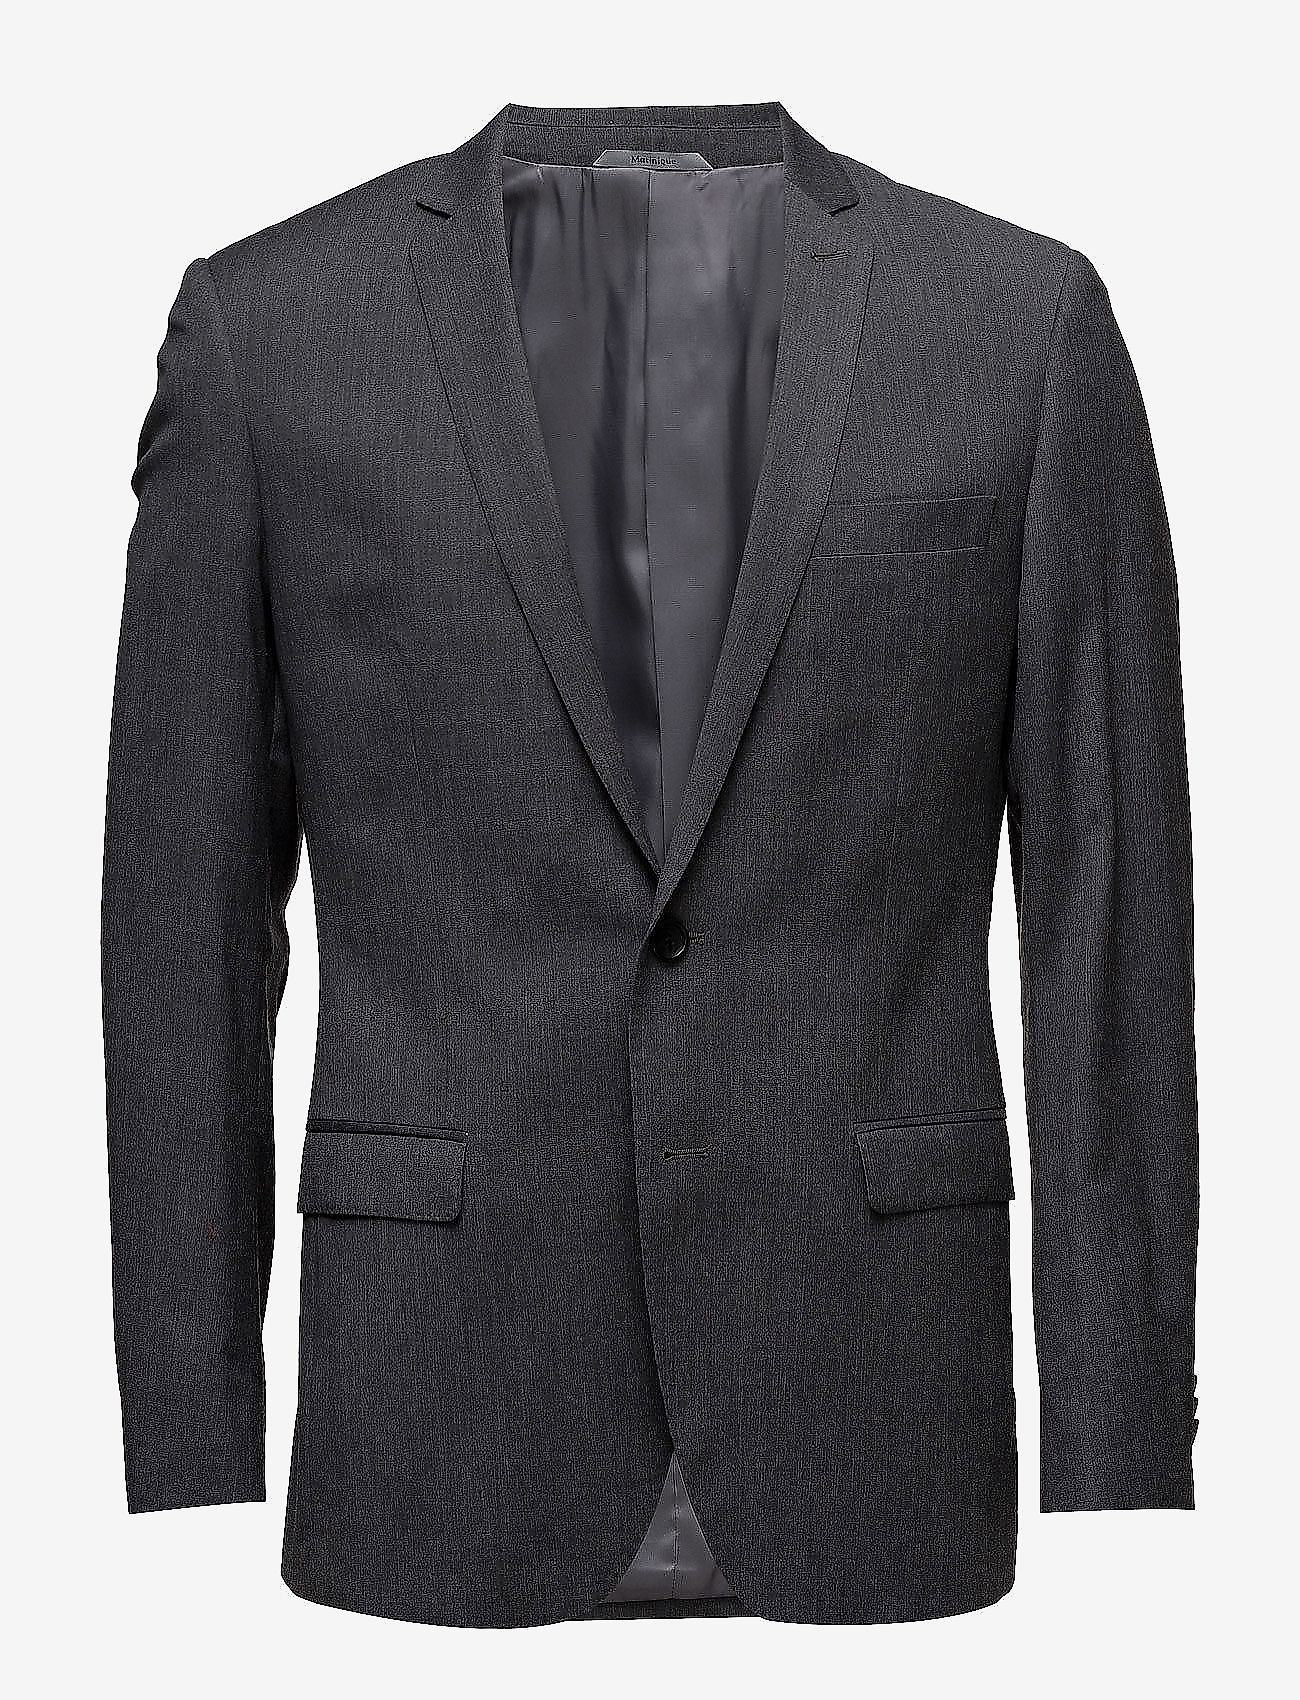 Matinique - BARRET B - single breasted blazers - dark grey mel